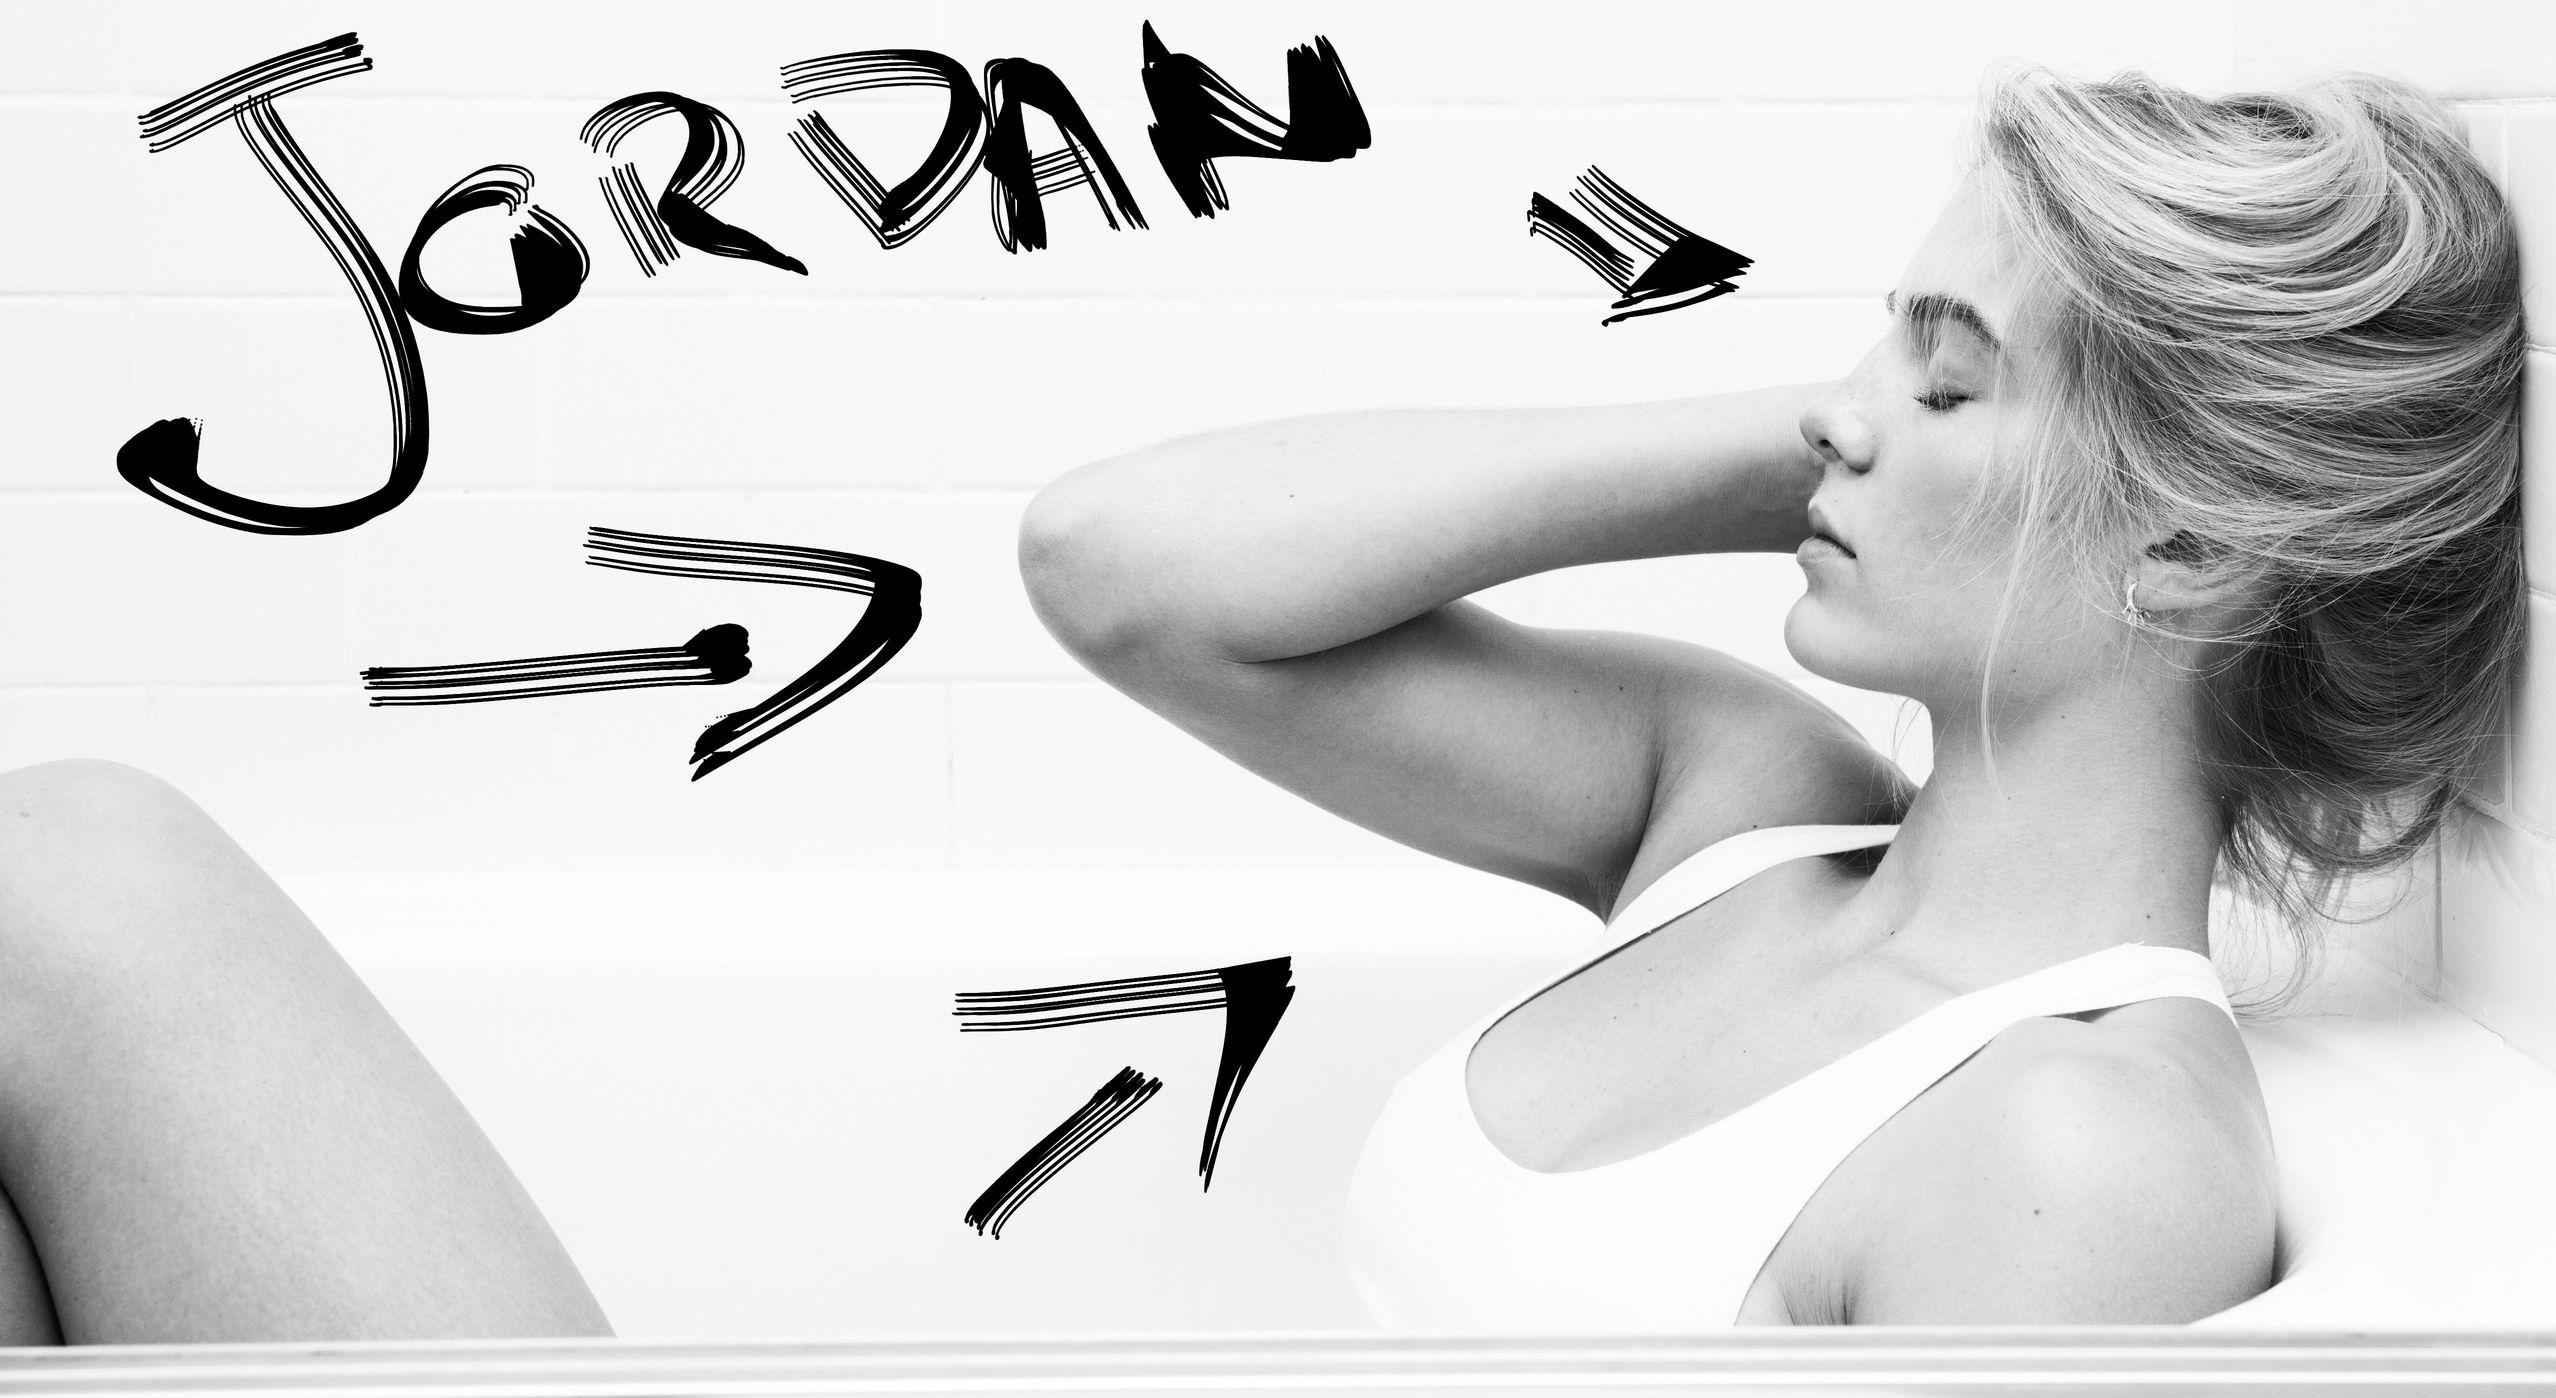 Jordan Murray See Through (16 Photos)